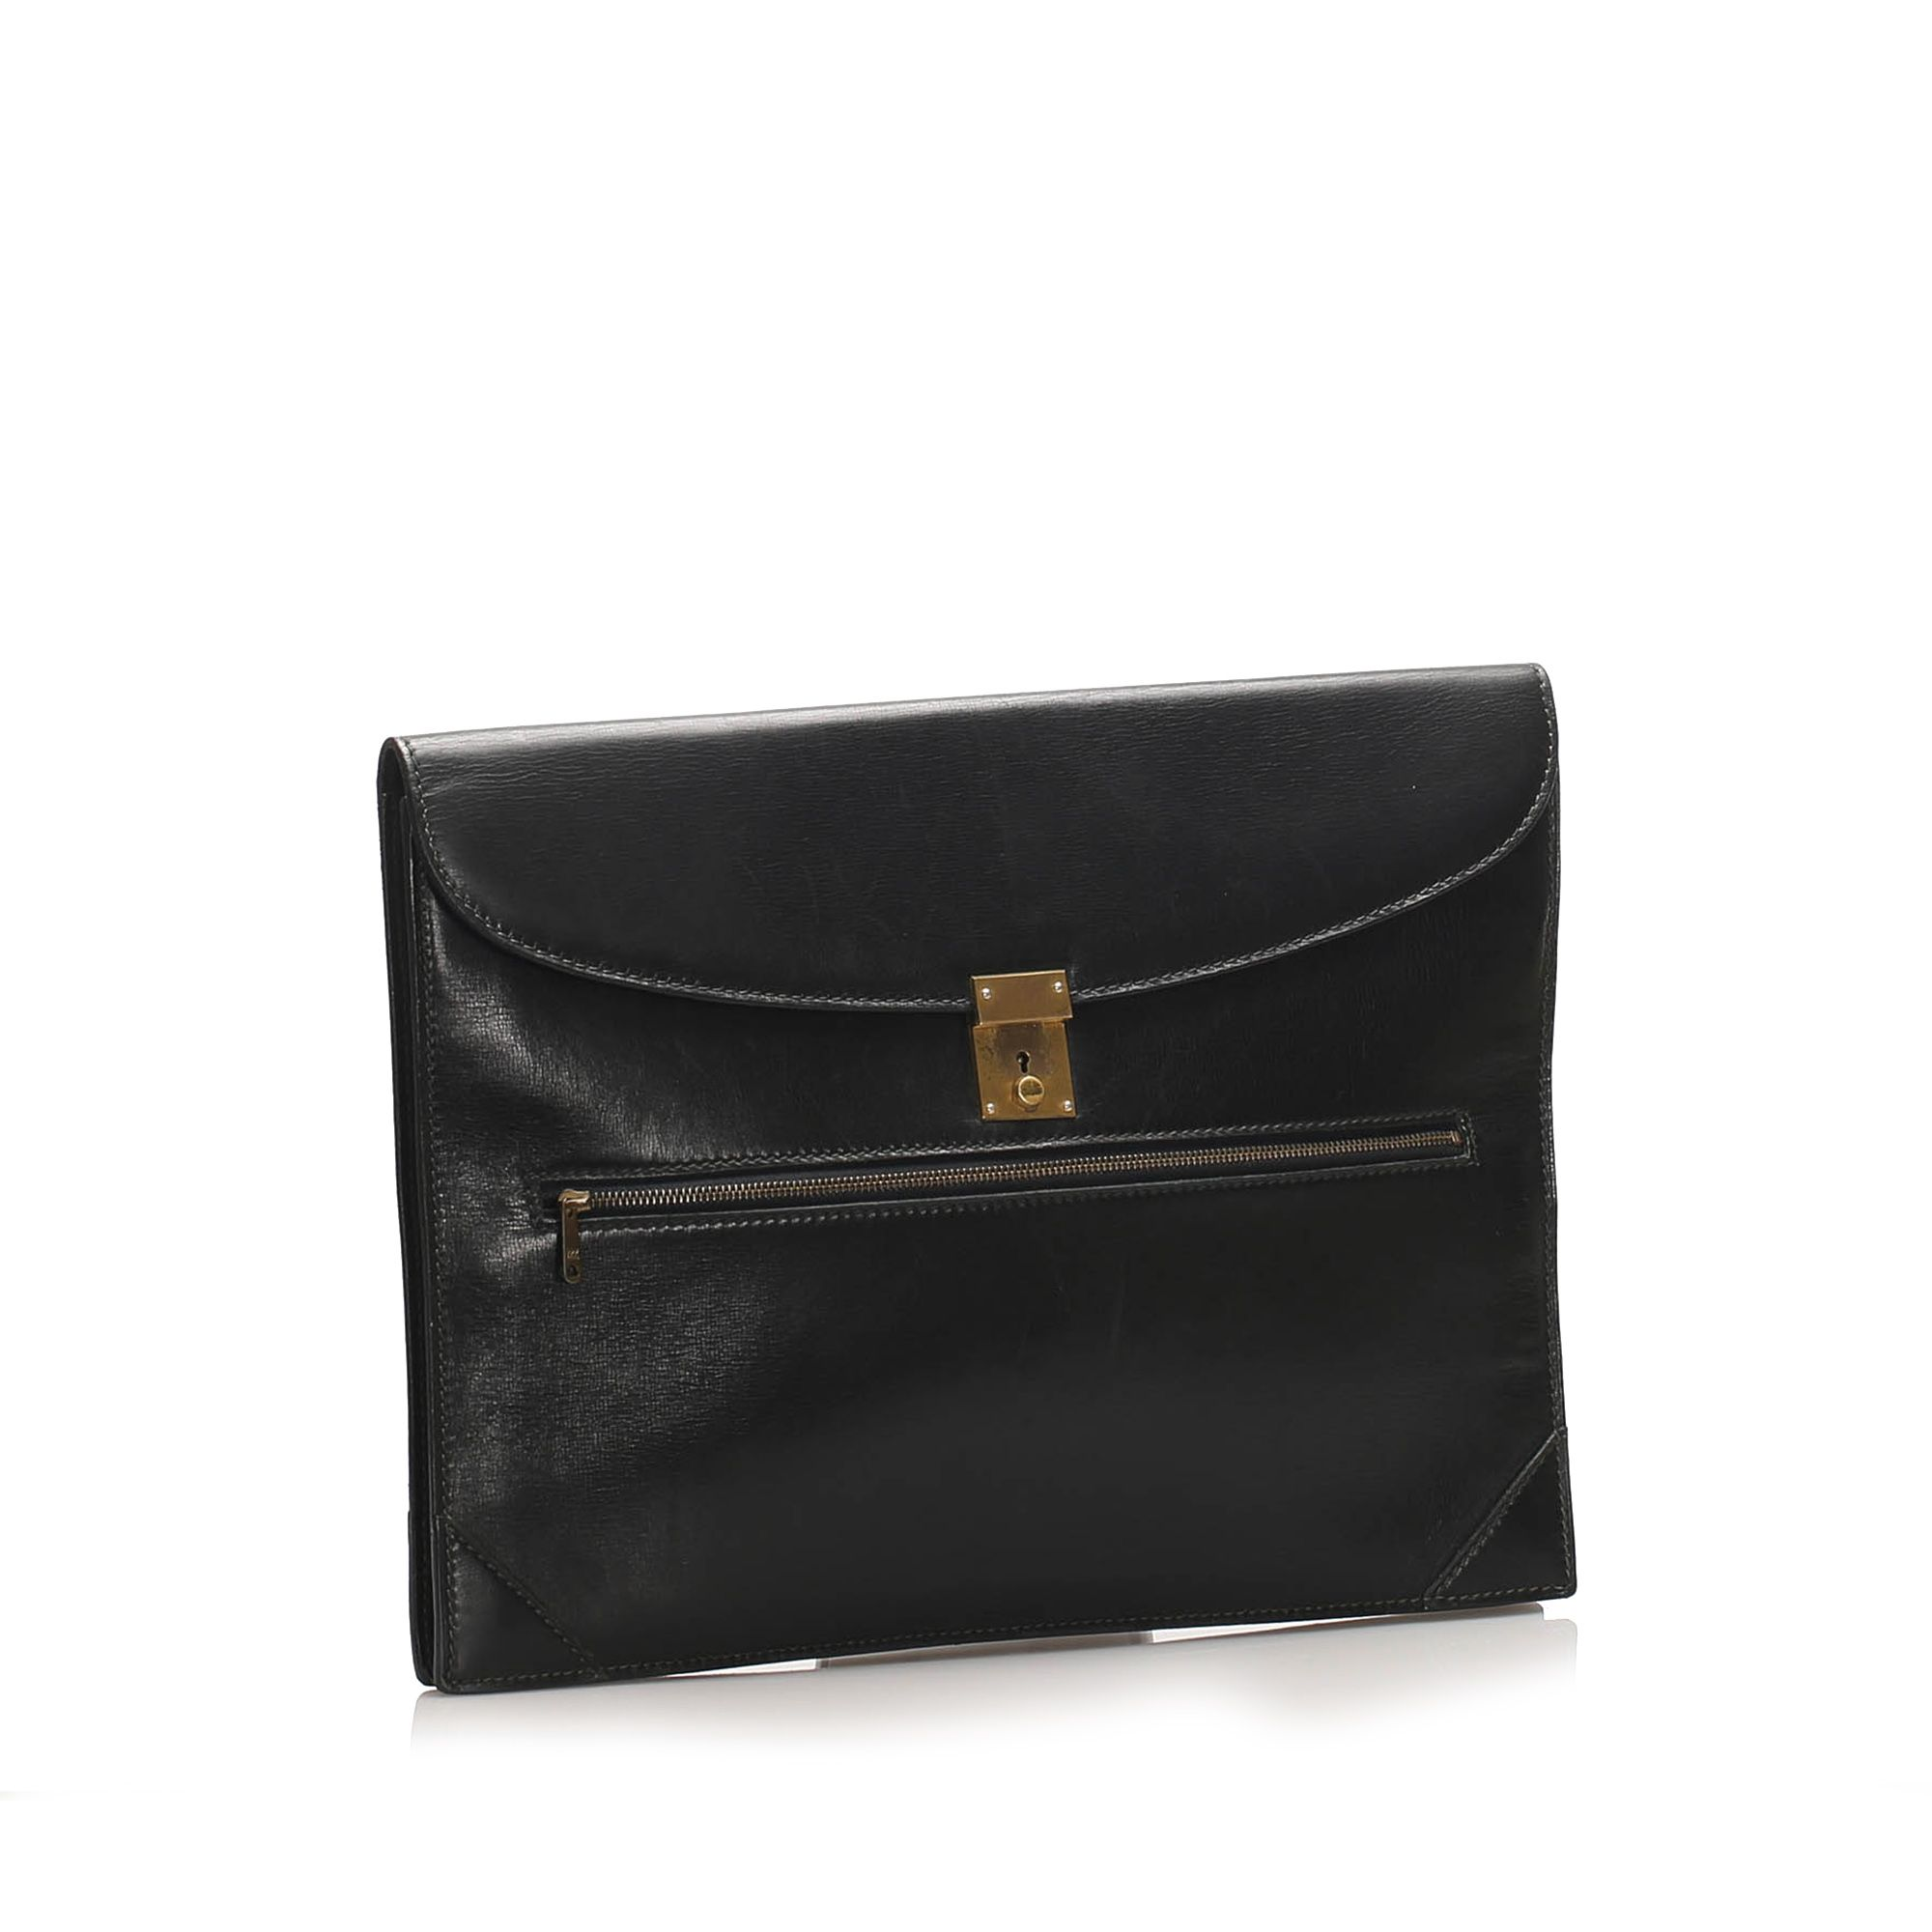 Vintage Gucci Leather Clutch Bag Black